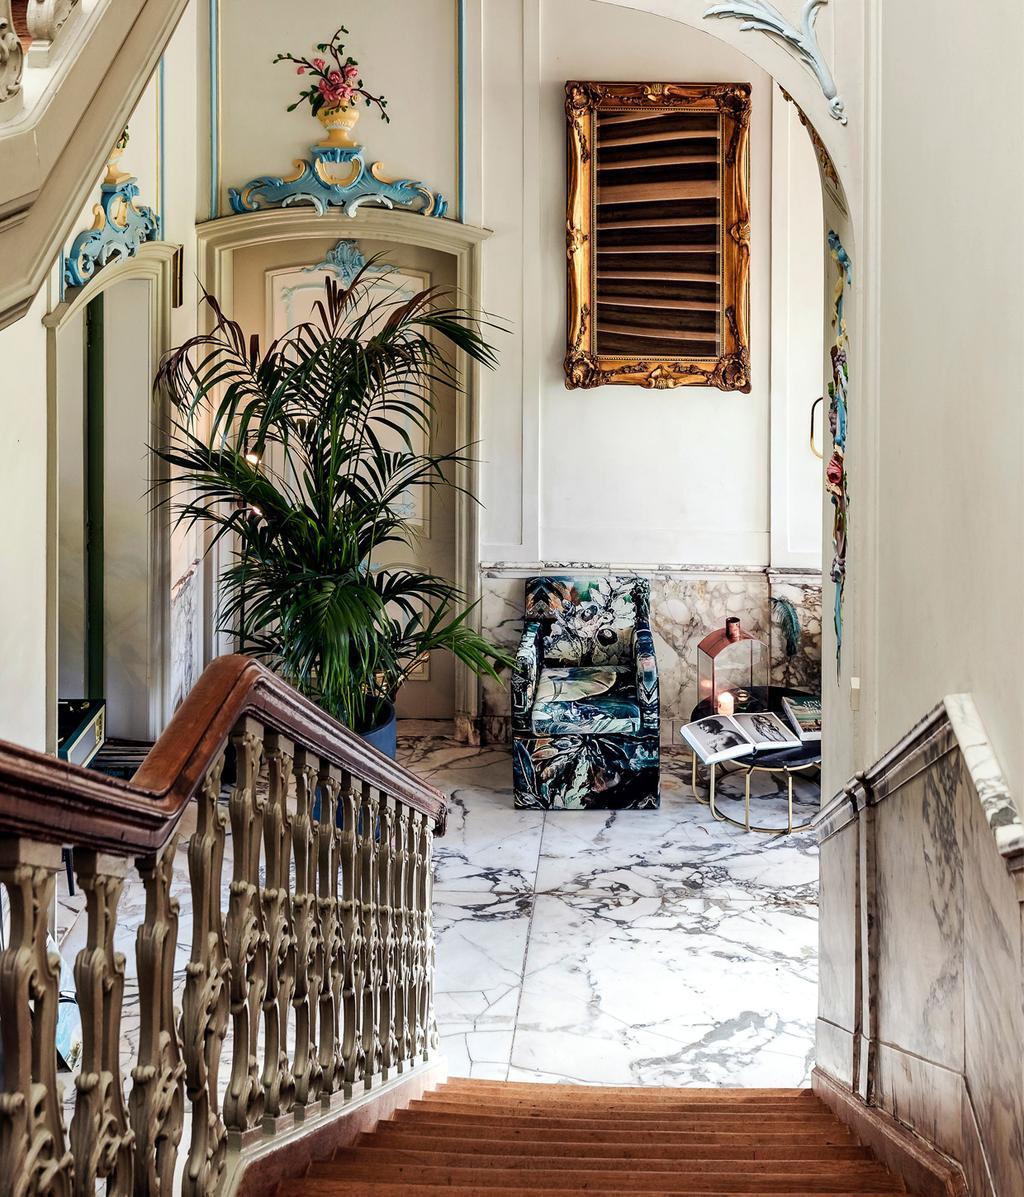 Marmer | Trap | Rococo-interieur | vtwonen 01-2021